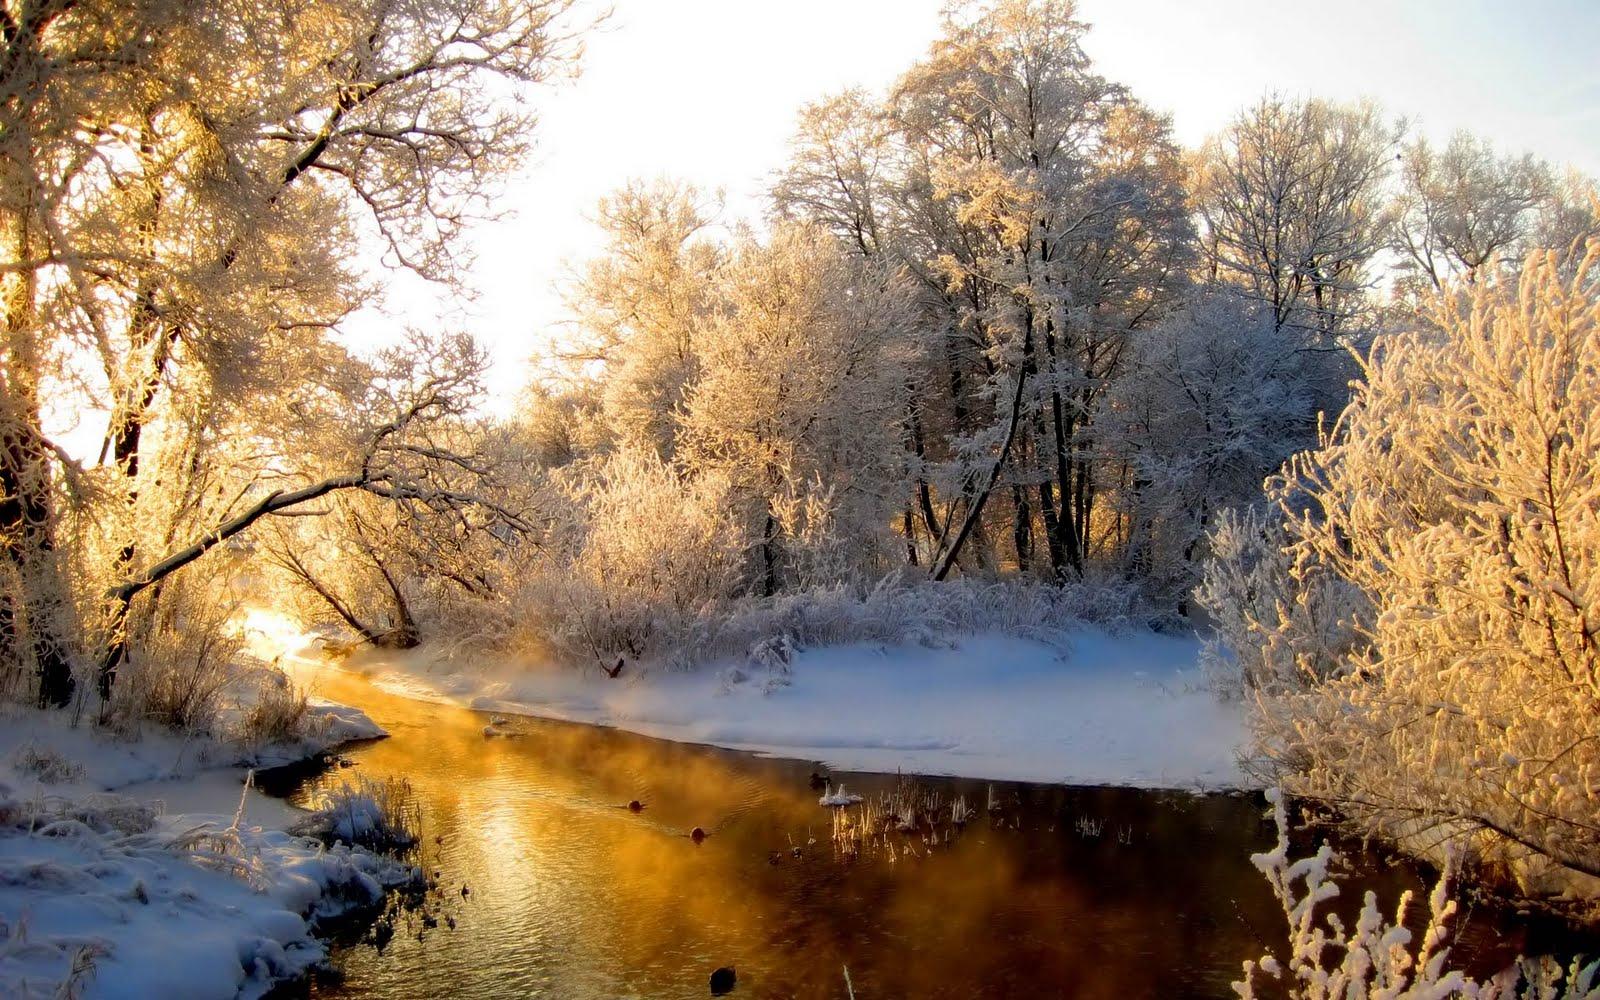 Sfondi desktop 3d paesaggio hd innevato sfondi hd gratis for Paesaggi invernali per desktop